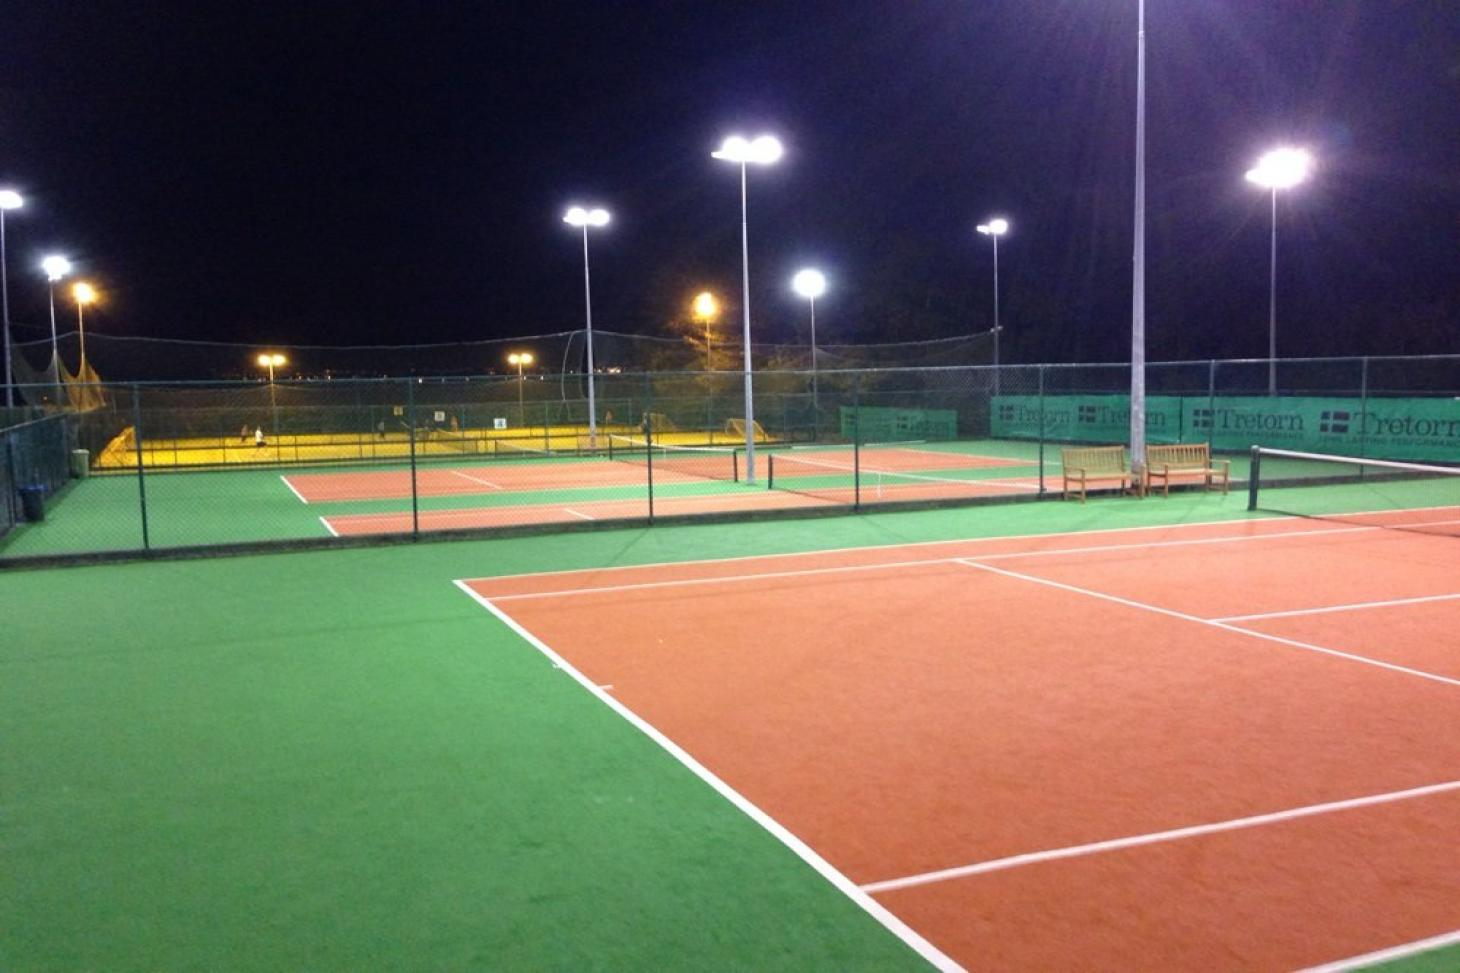 Portmarnock Sports & Leisure Club Outdoor   Astroturf tennis court